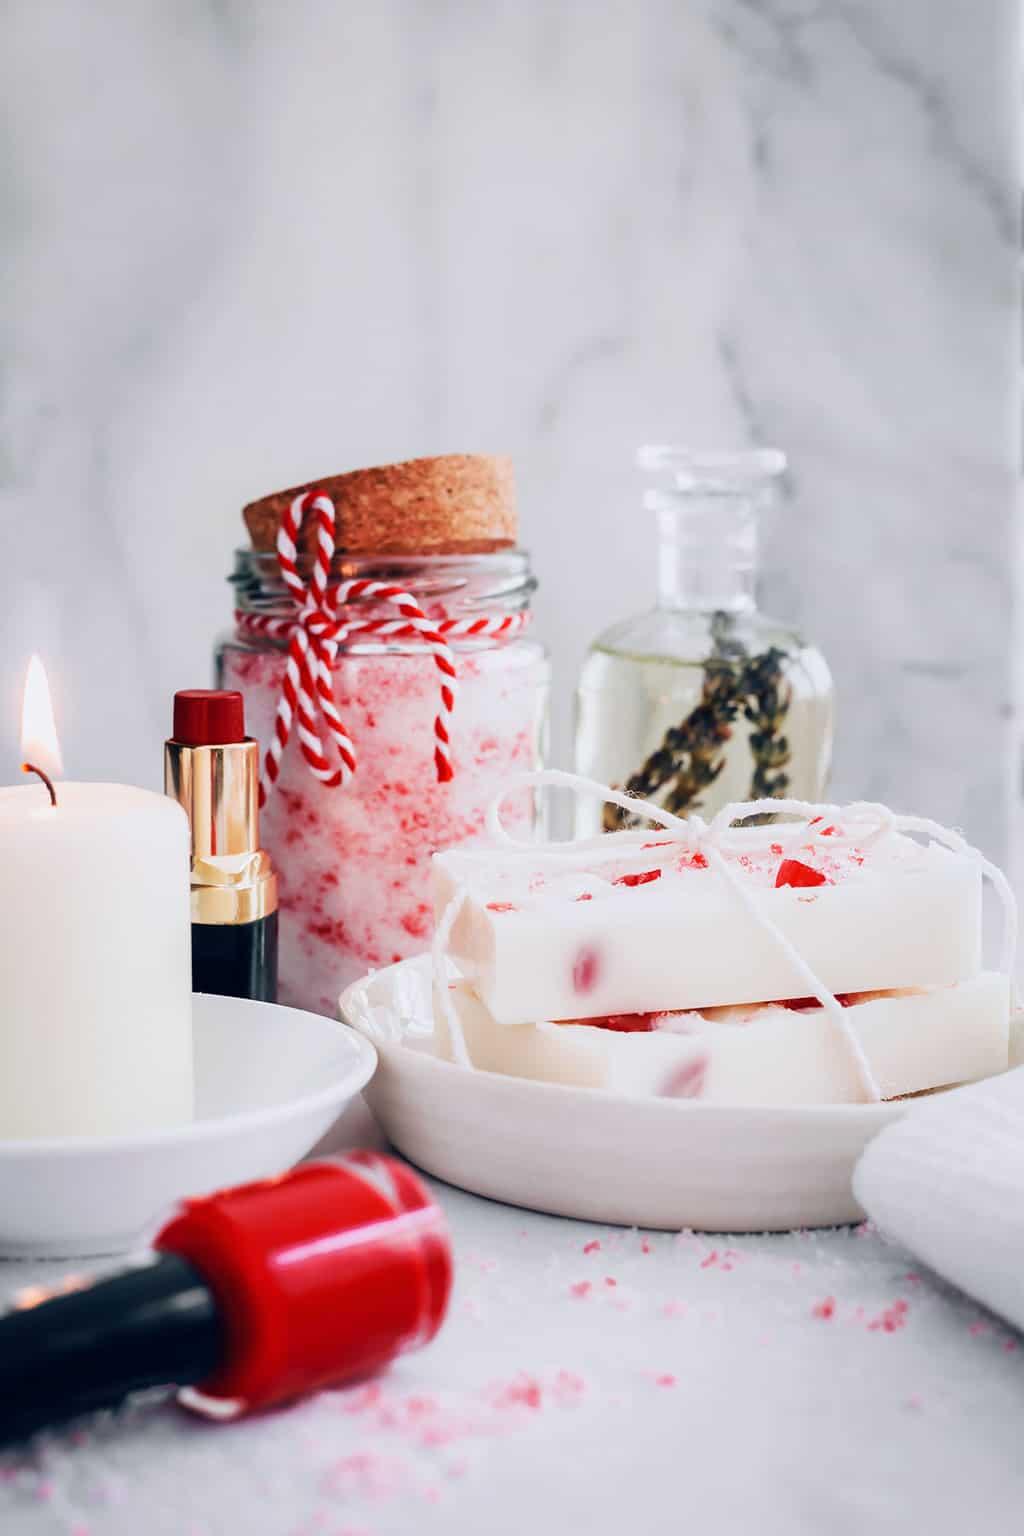 DIY Peppermint Beauty Gift Basket